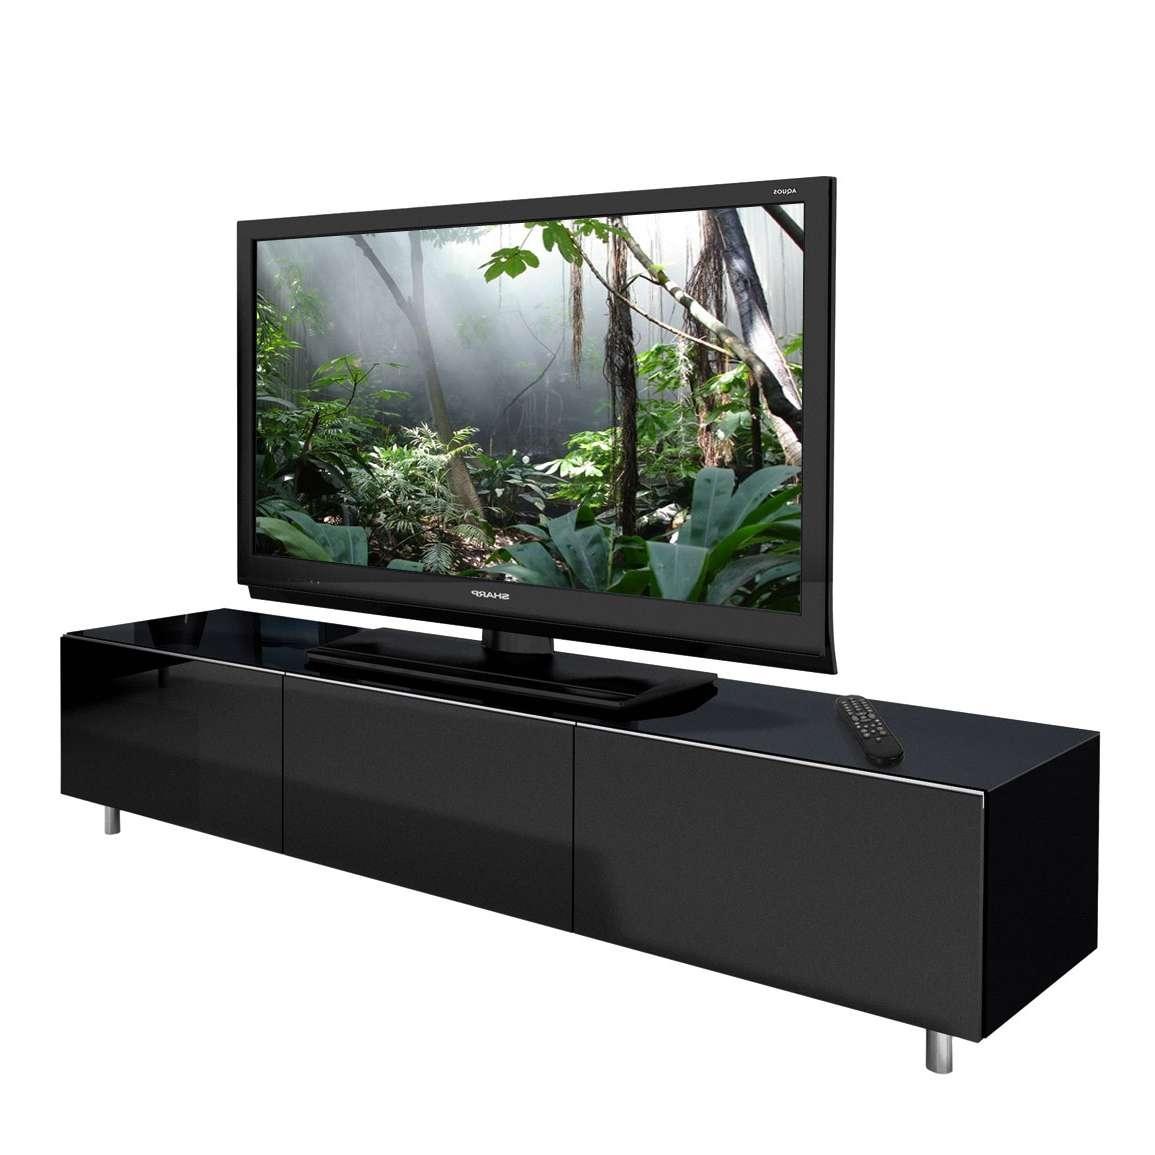 Spectral Just Racks Jrl1650S Gloss Black Tv Cabinet – Just Racks Intended For Shiny Black Tv Stands (View 10 of 15)